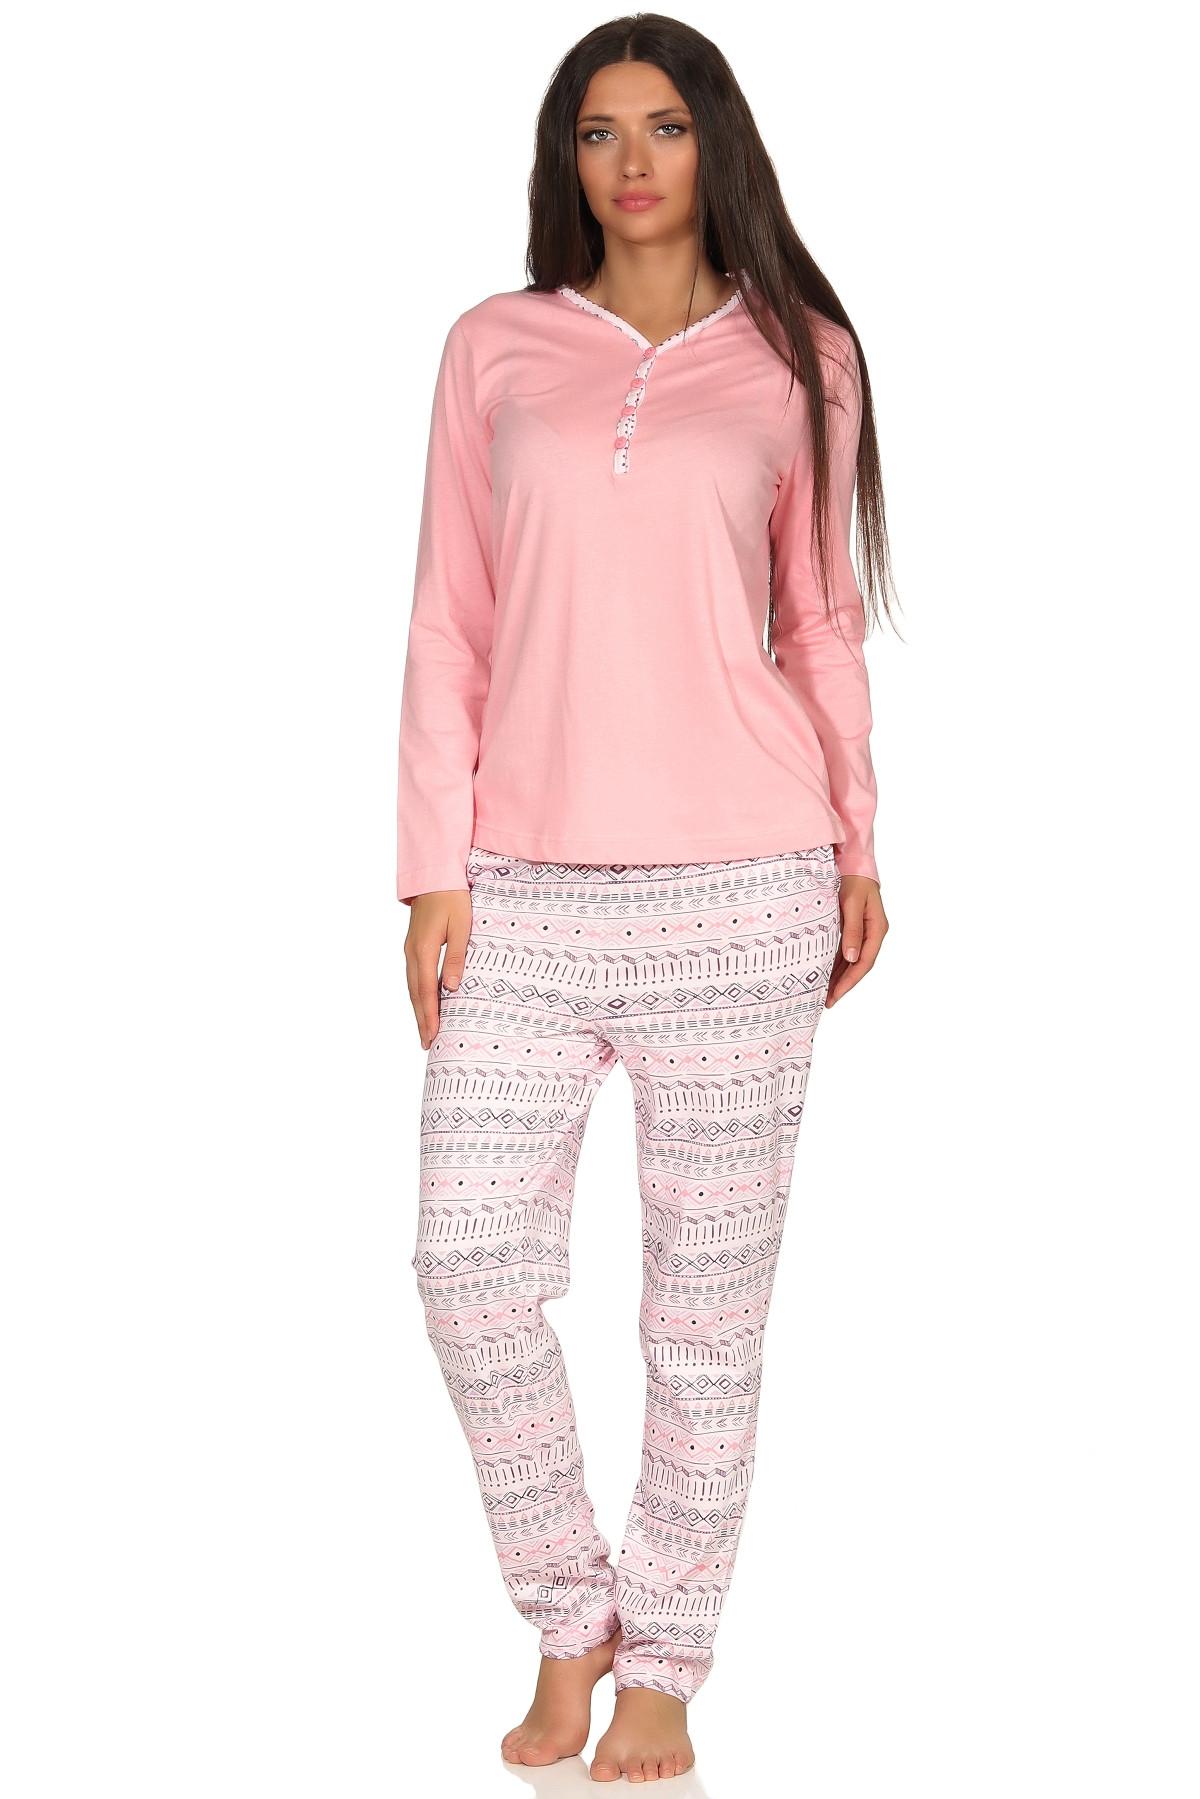 Dames pyjama Creative 66393-S 36/38-Blauw